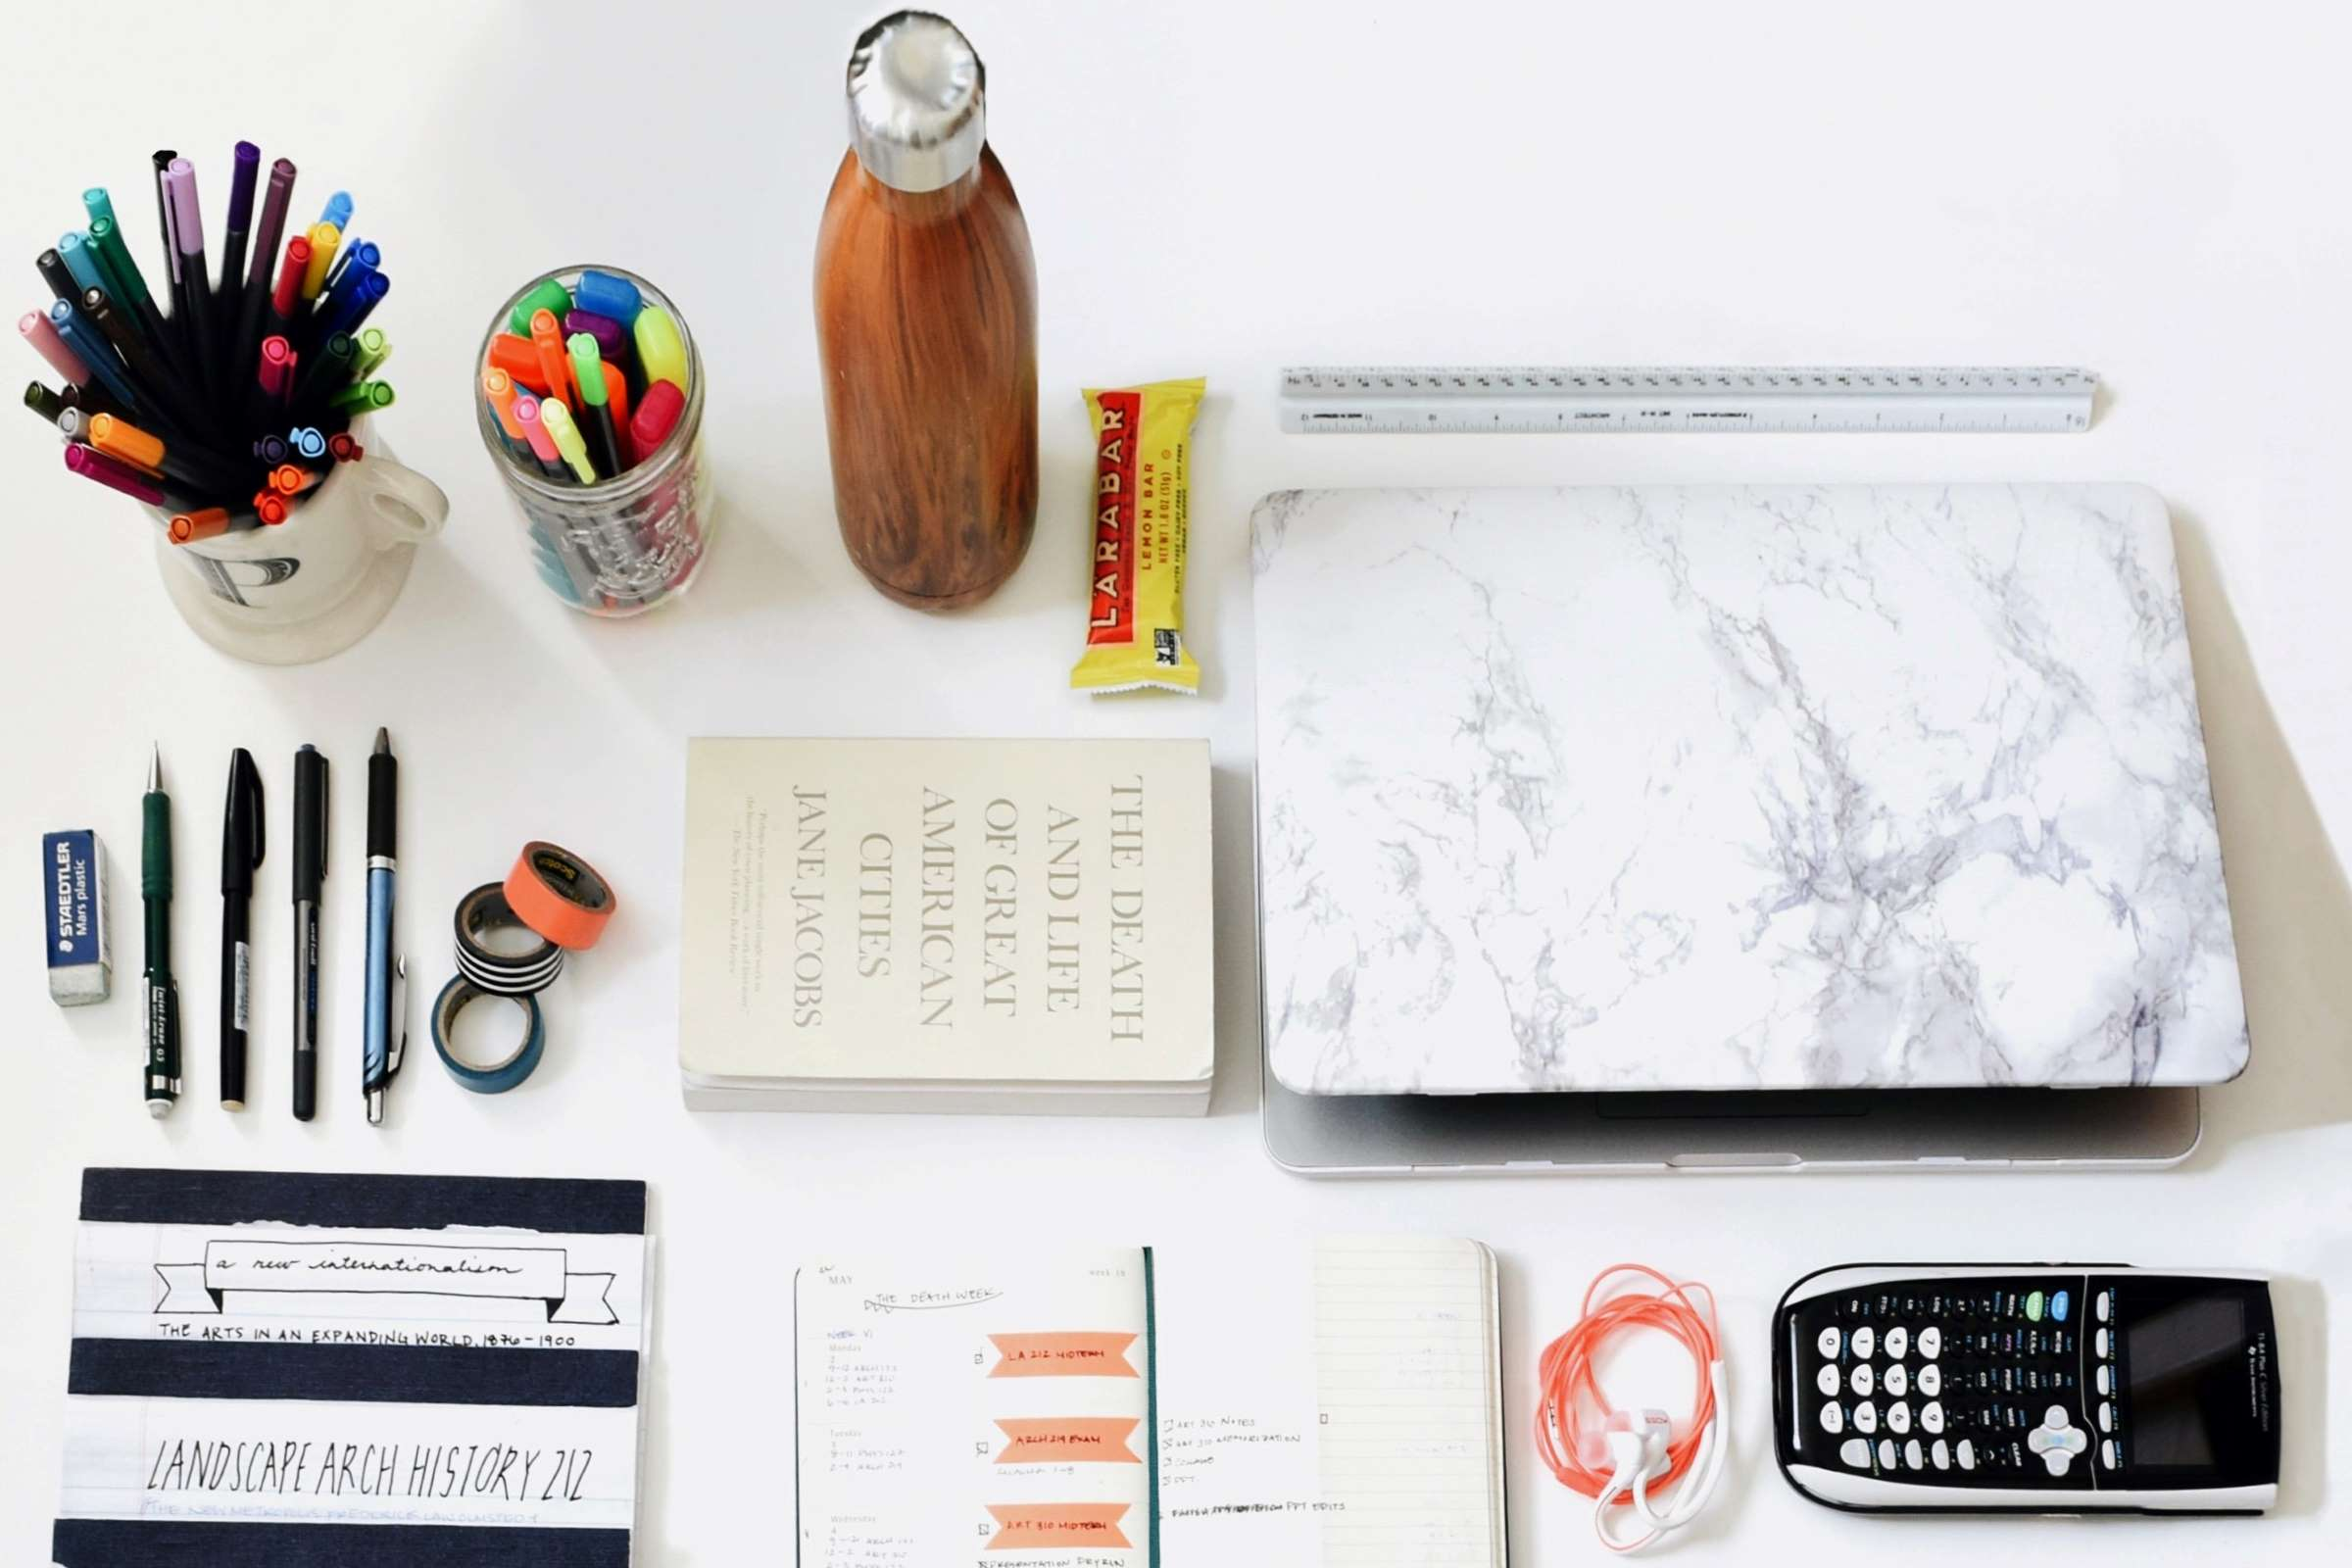 Bliv klar til studiestart: Din tjekliste